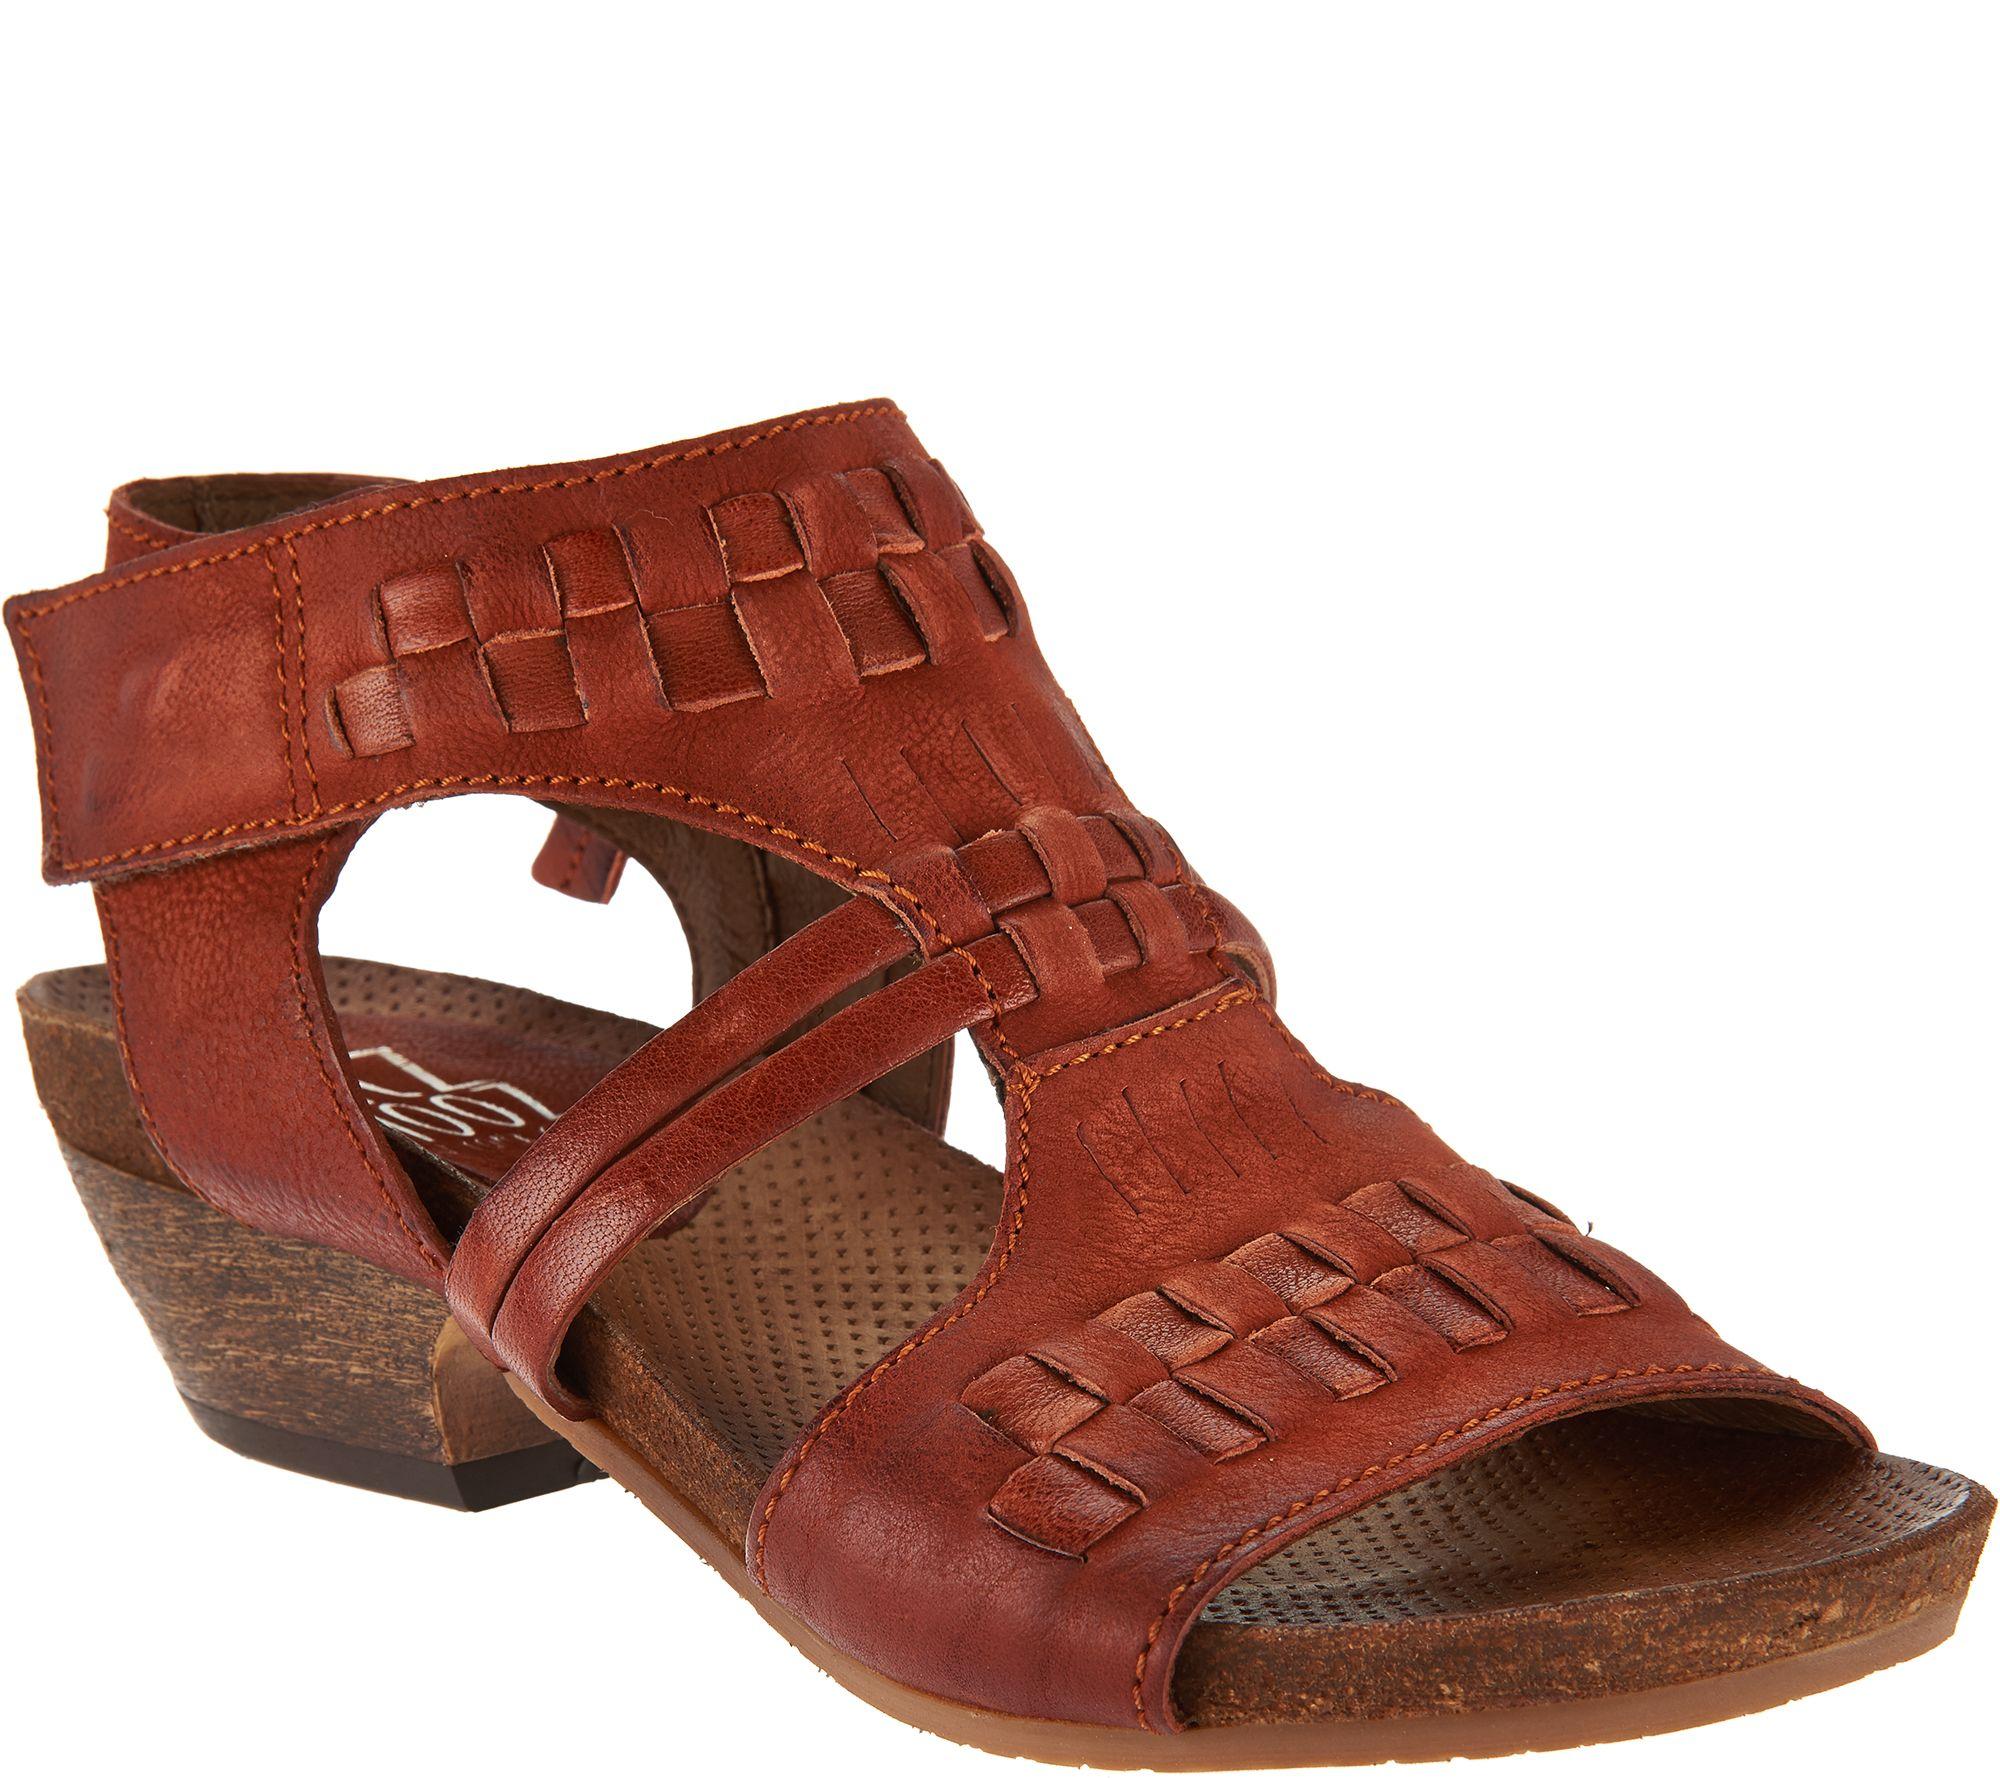 f3847bbec730 Miz Mooz Leather Woven Detail Sandals - Calico - Page 1 — QVC.com